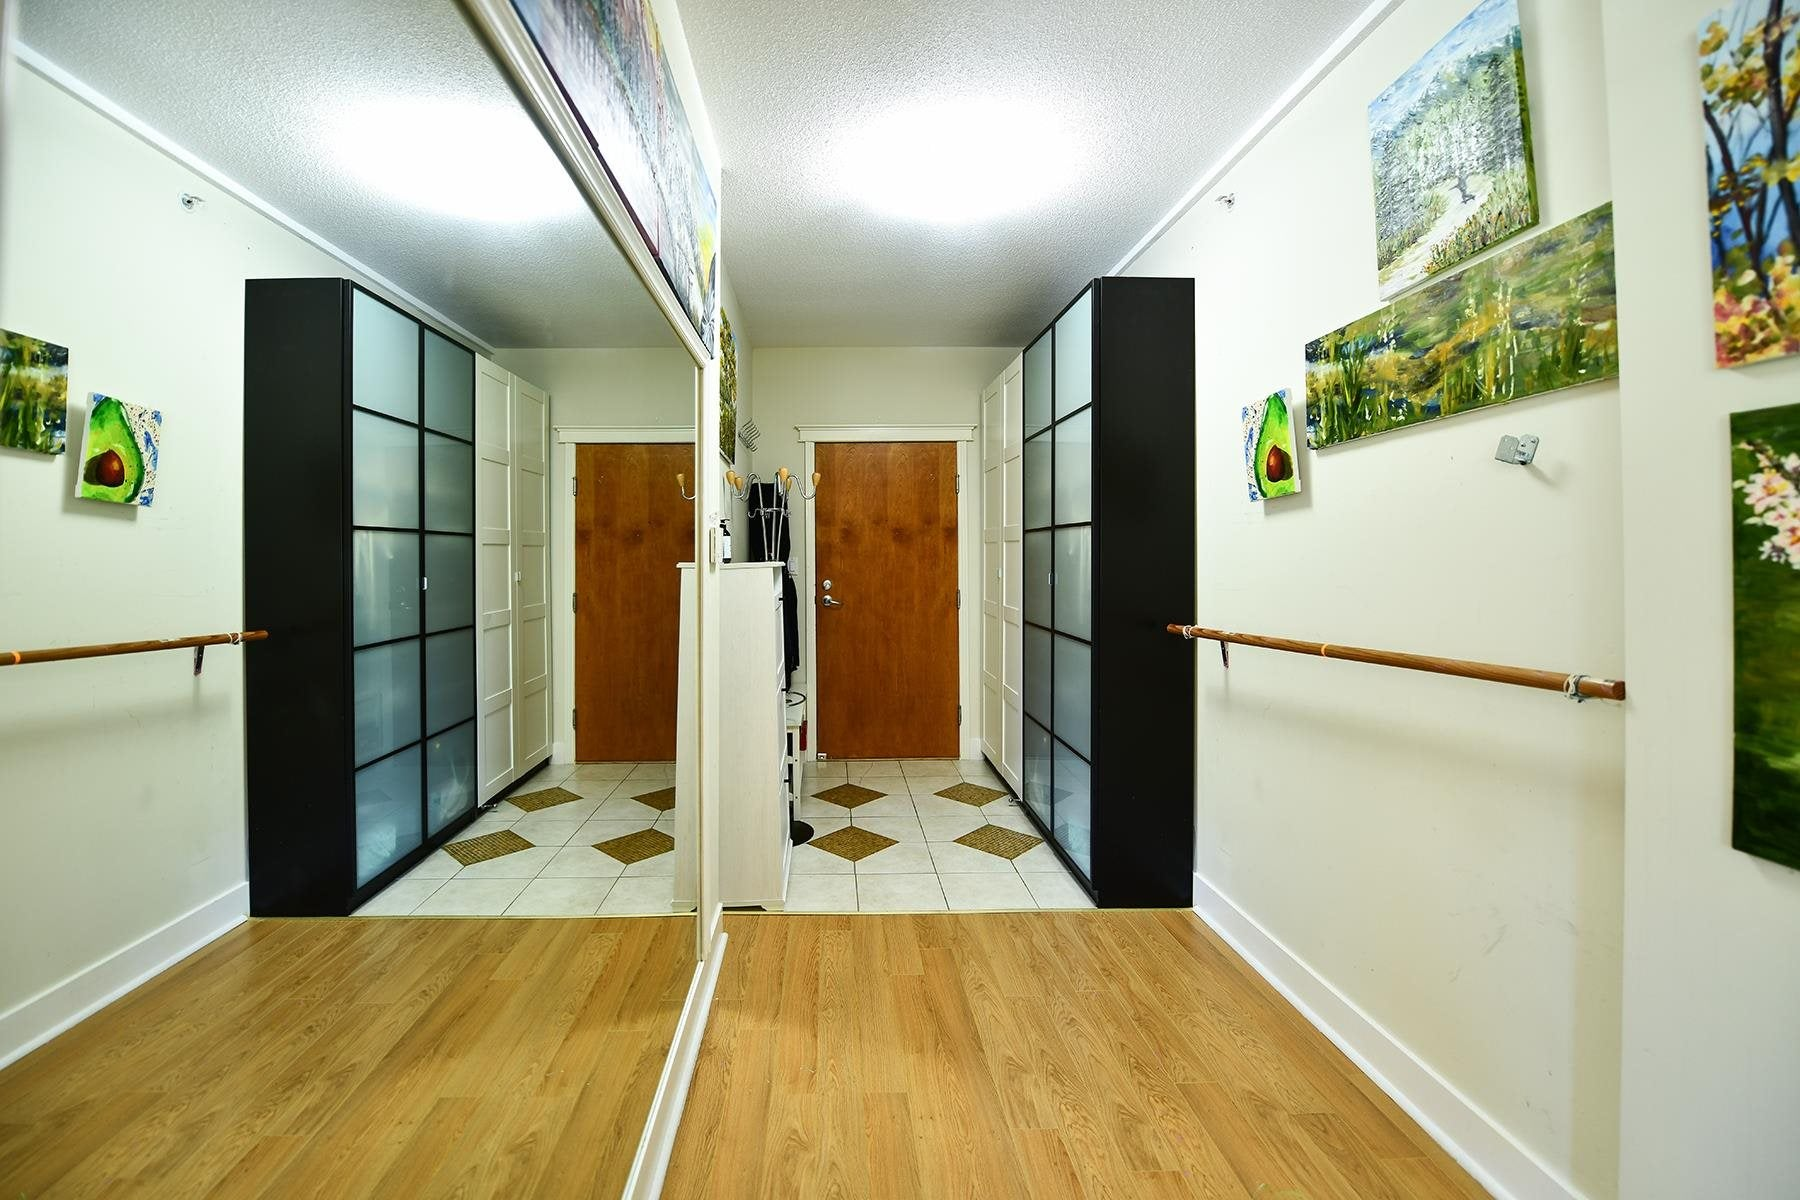 204 5790 EAST BOULEVARD - Kerrisdale Apartment/Condo for sale, 3 Bedrooms (R2604138) - #11